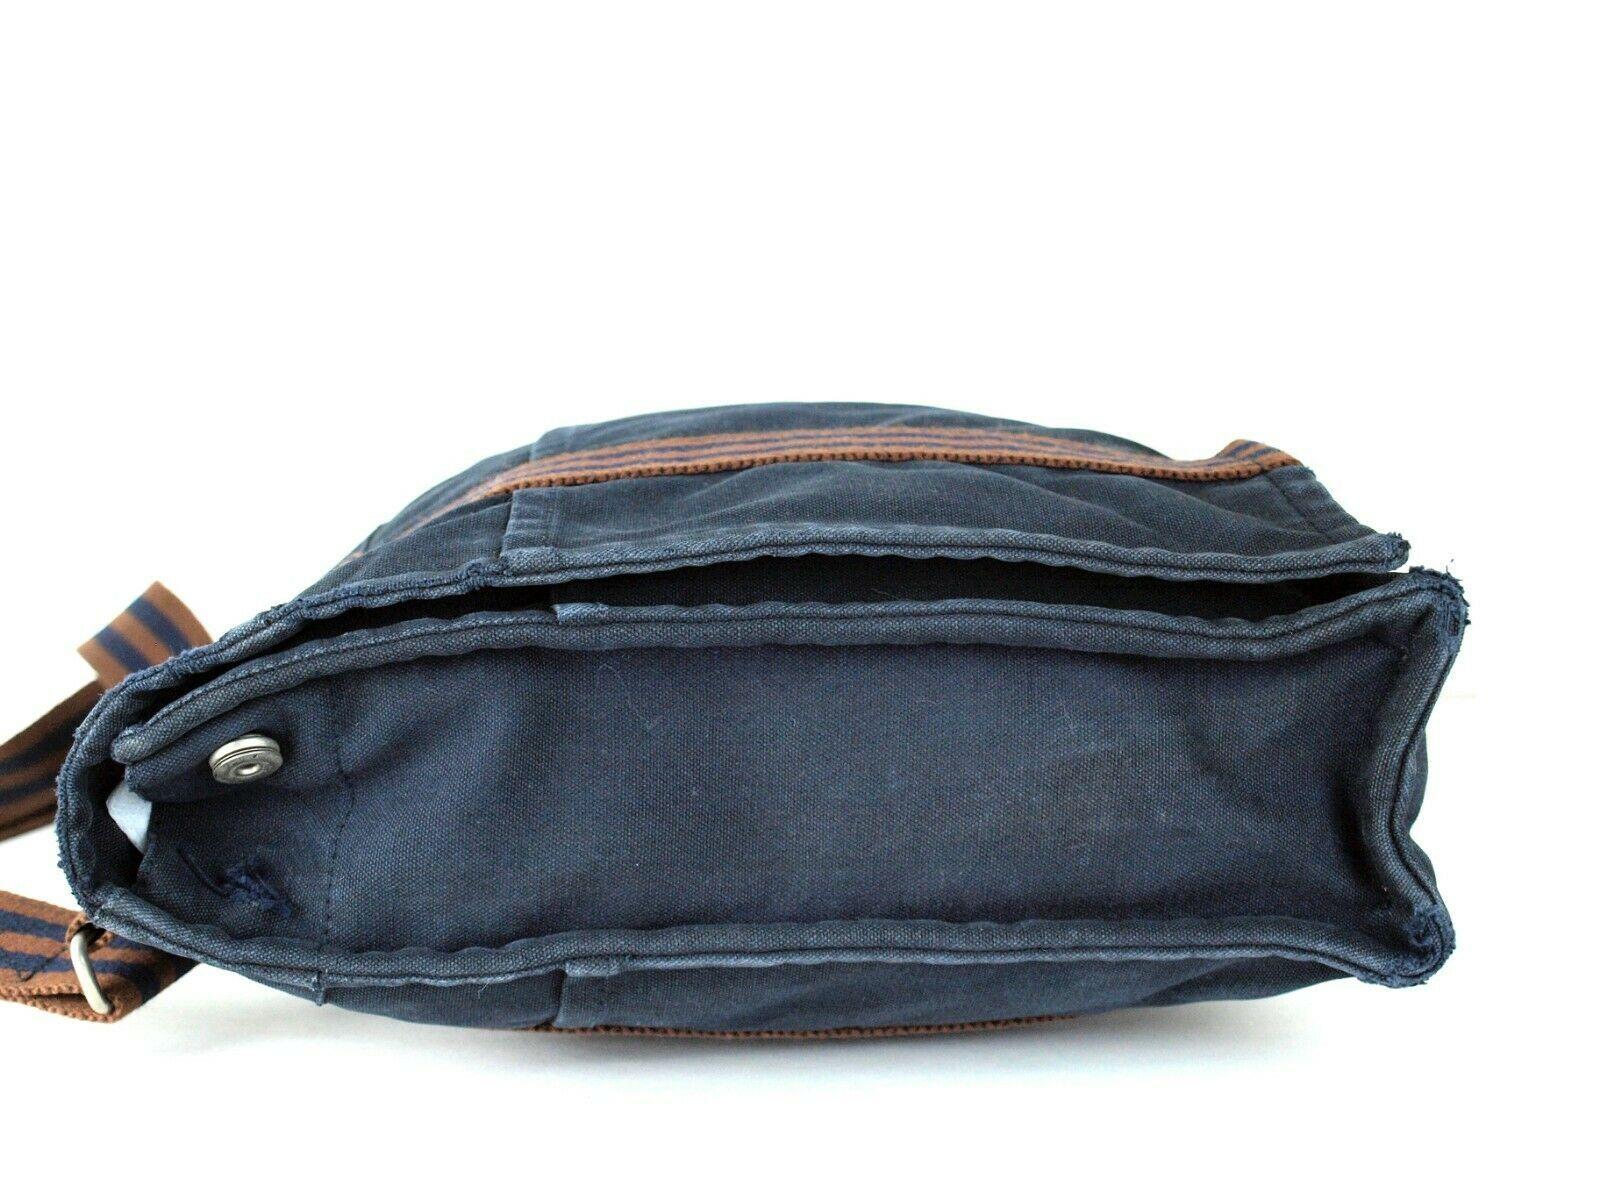 Auth Hermes Fool Toe Vassus MM Navy Cotton Canvas Shoulder Bag Purse France Used image 6